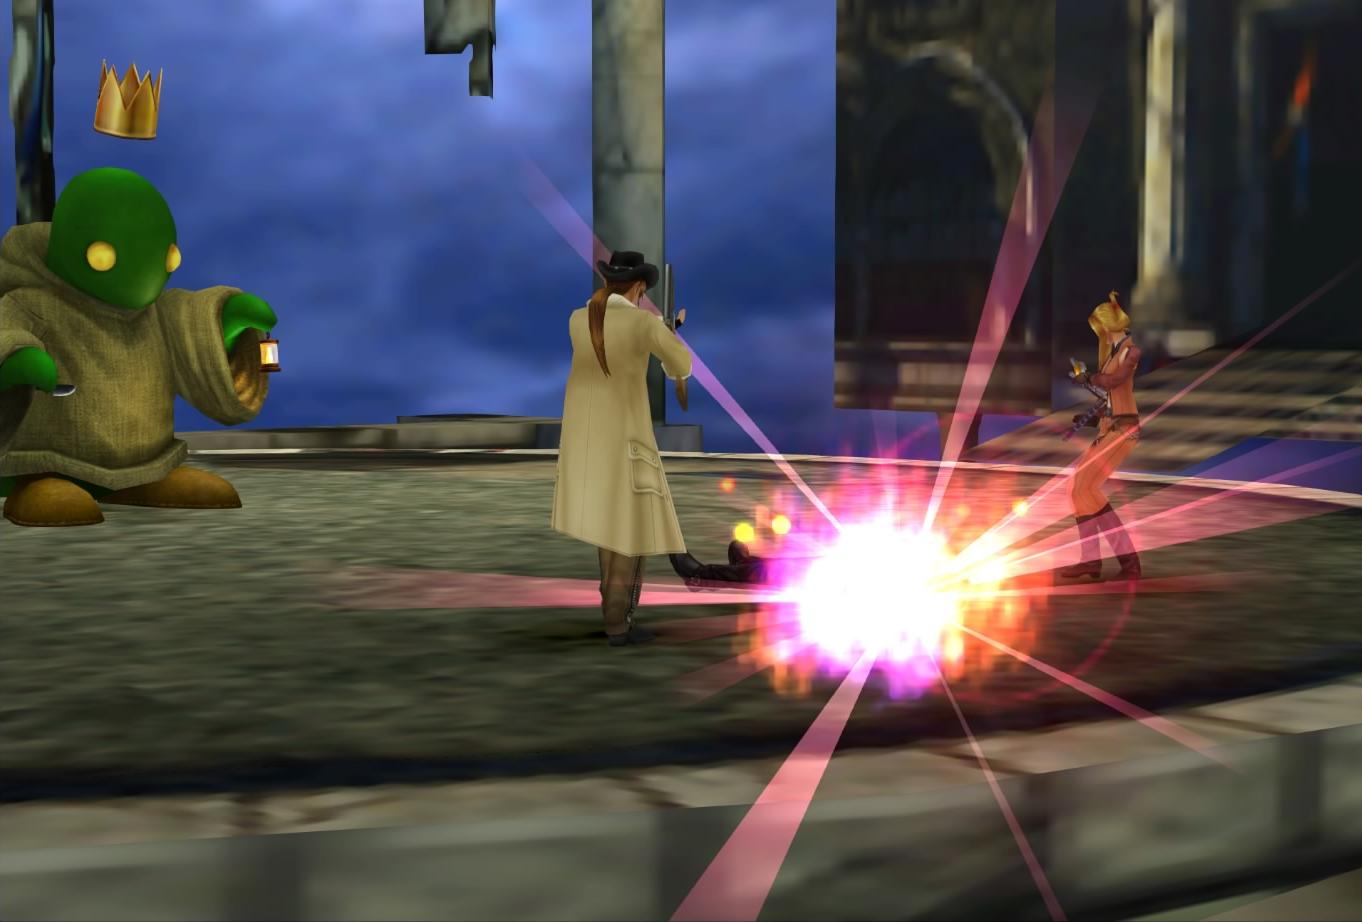 Life (Final Fantasy VIII)